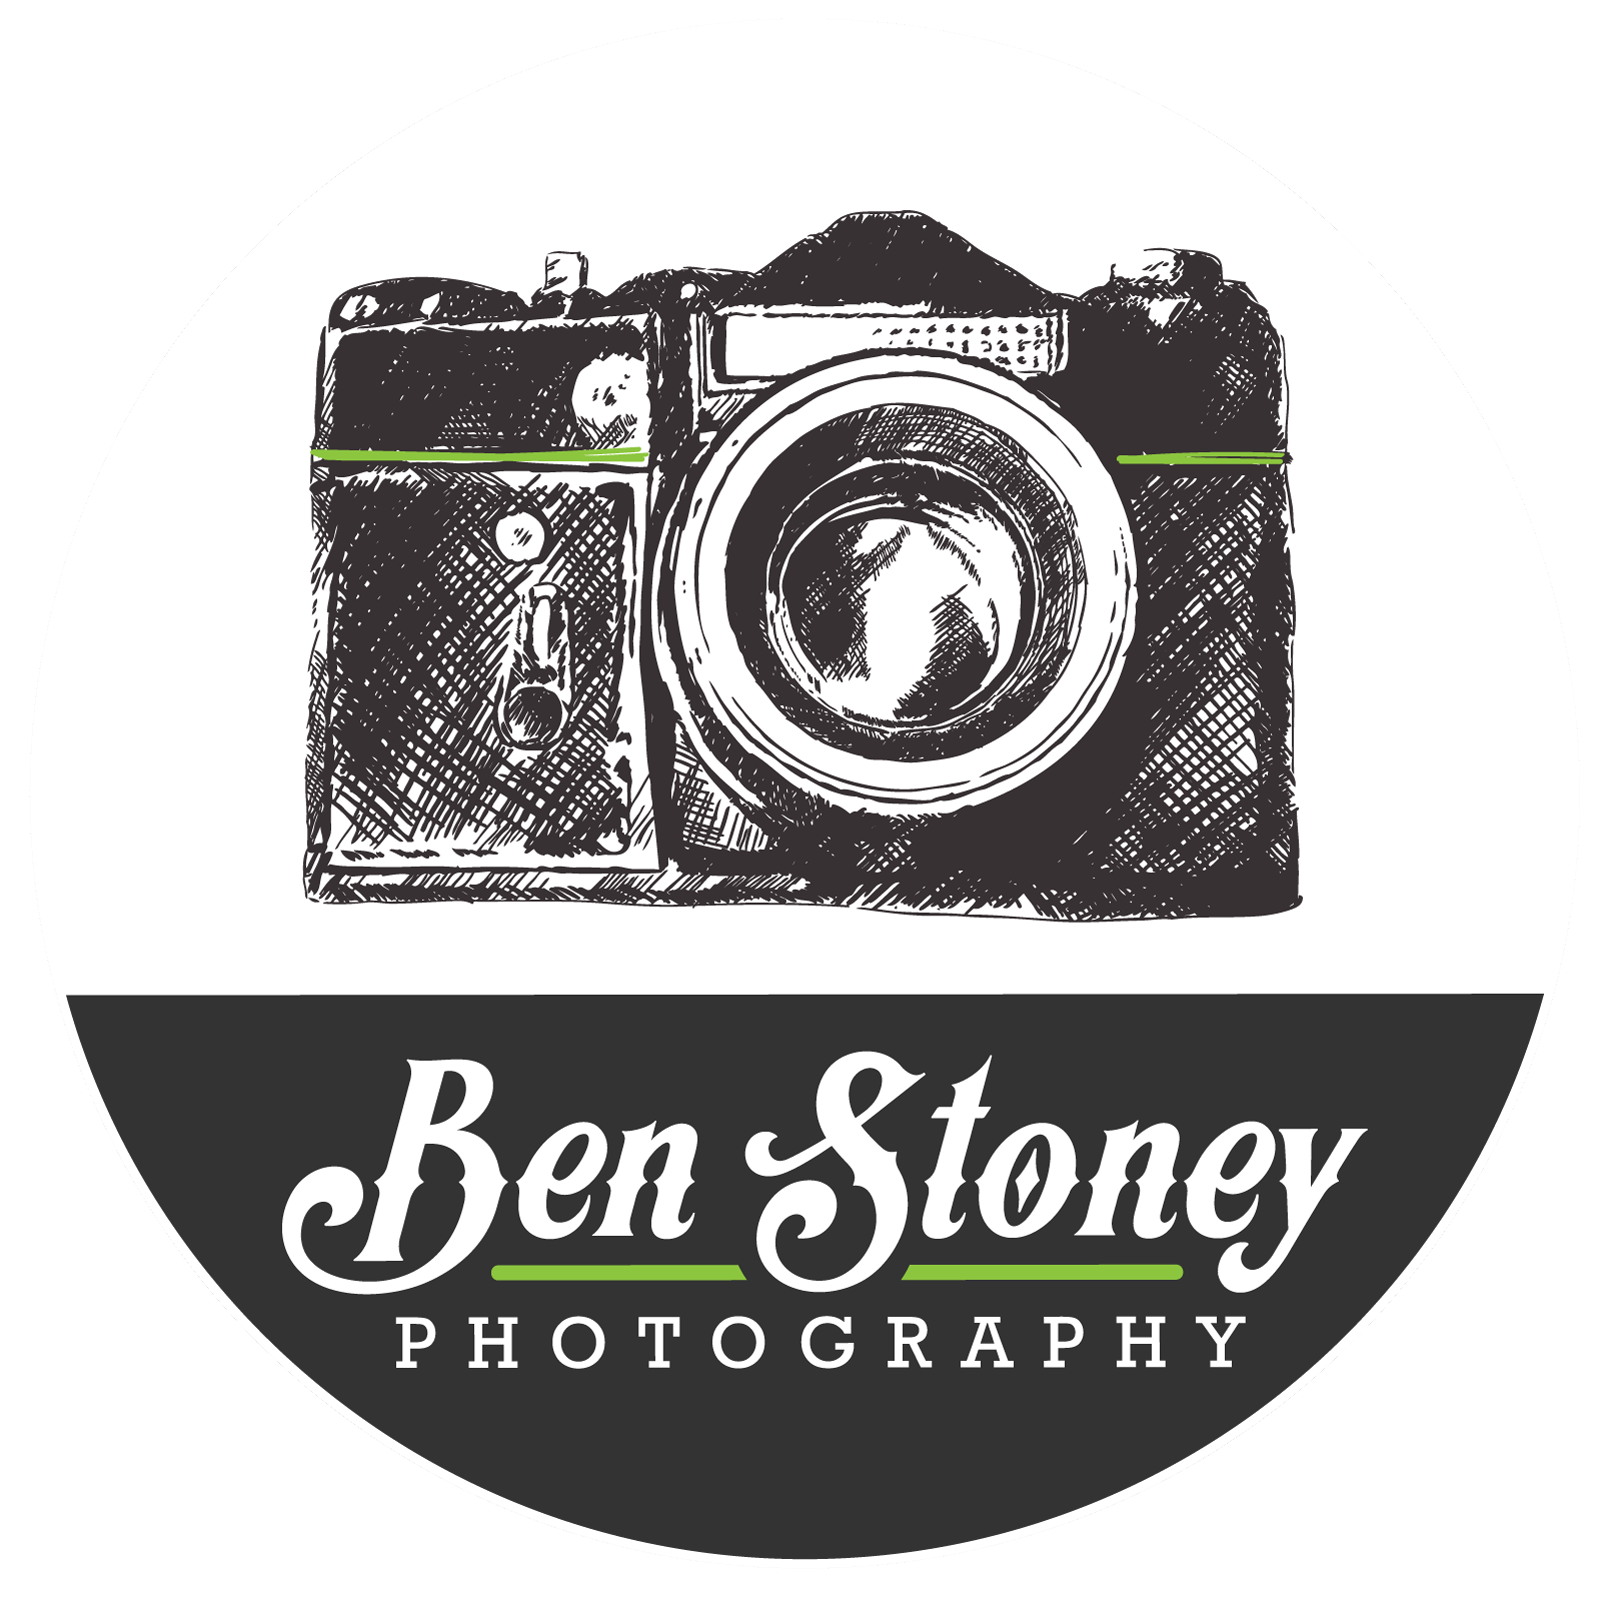 Ben-Stoney-Logo-15-Web-4